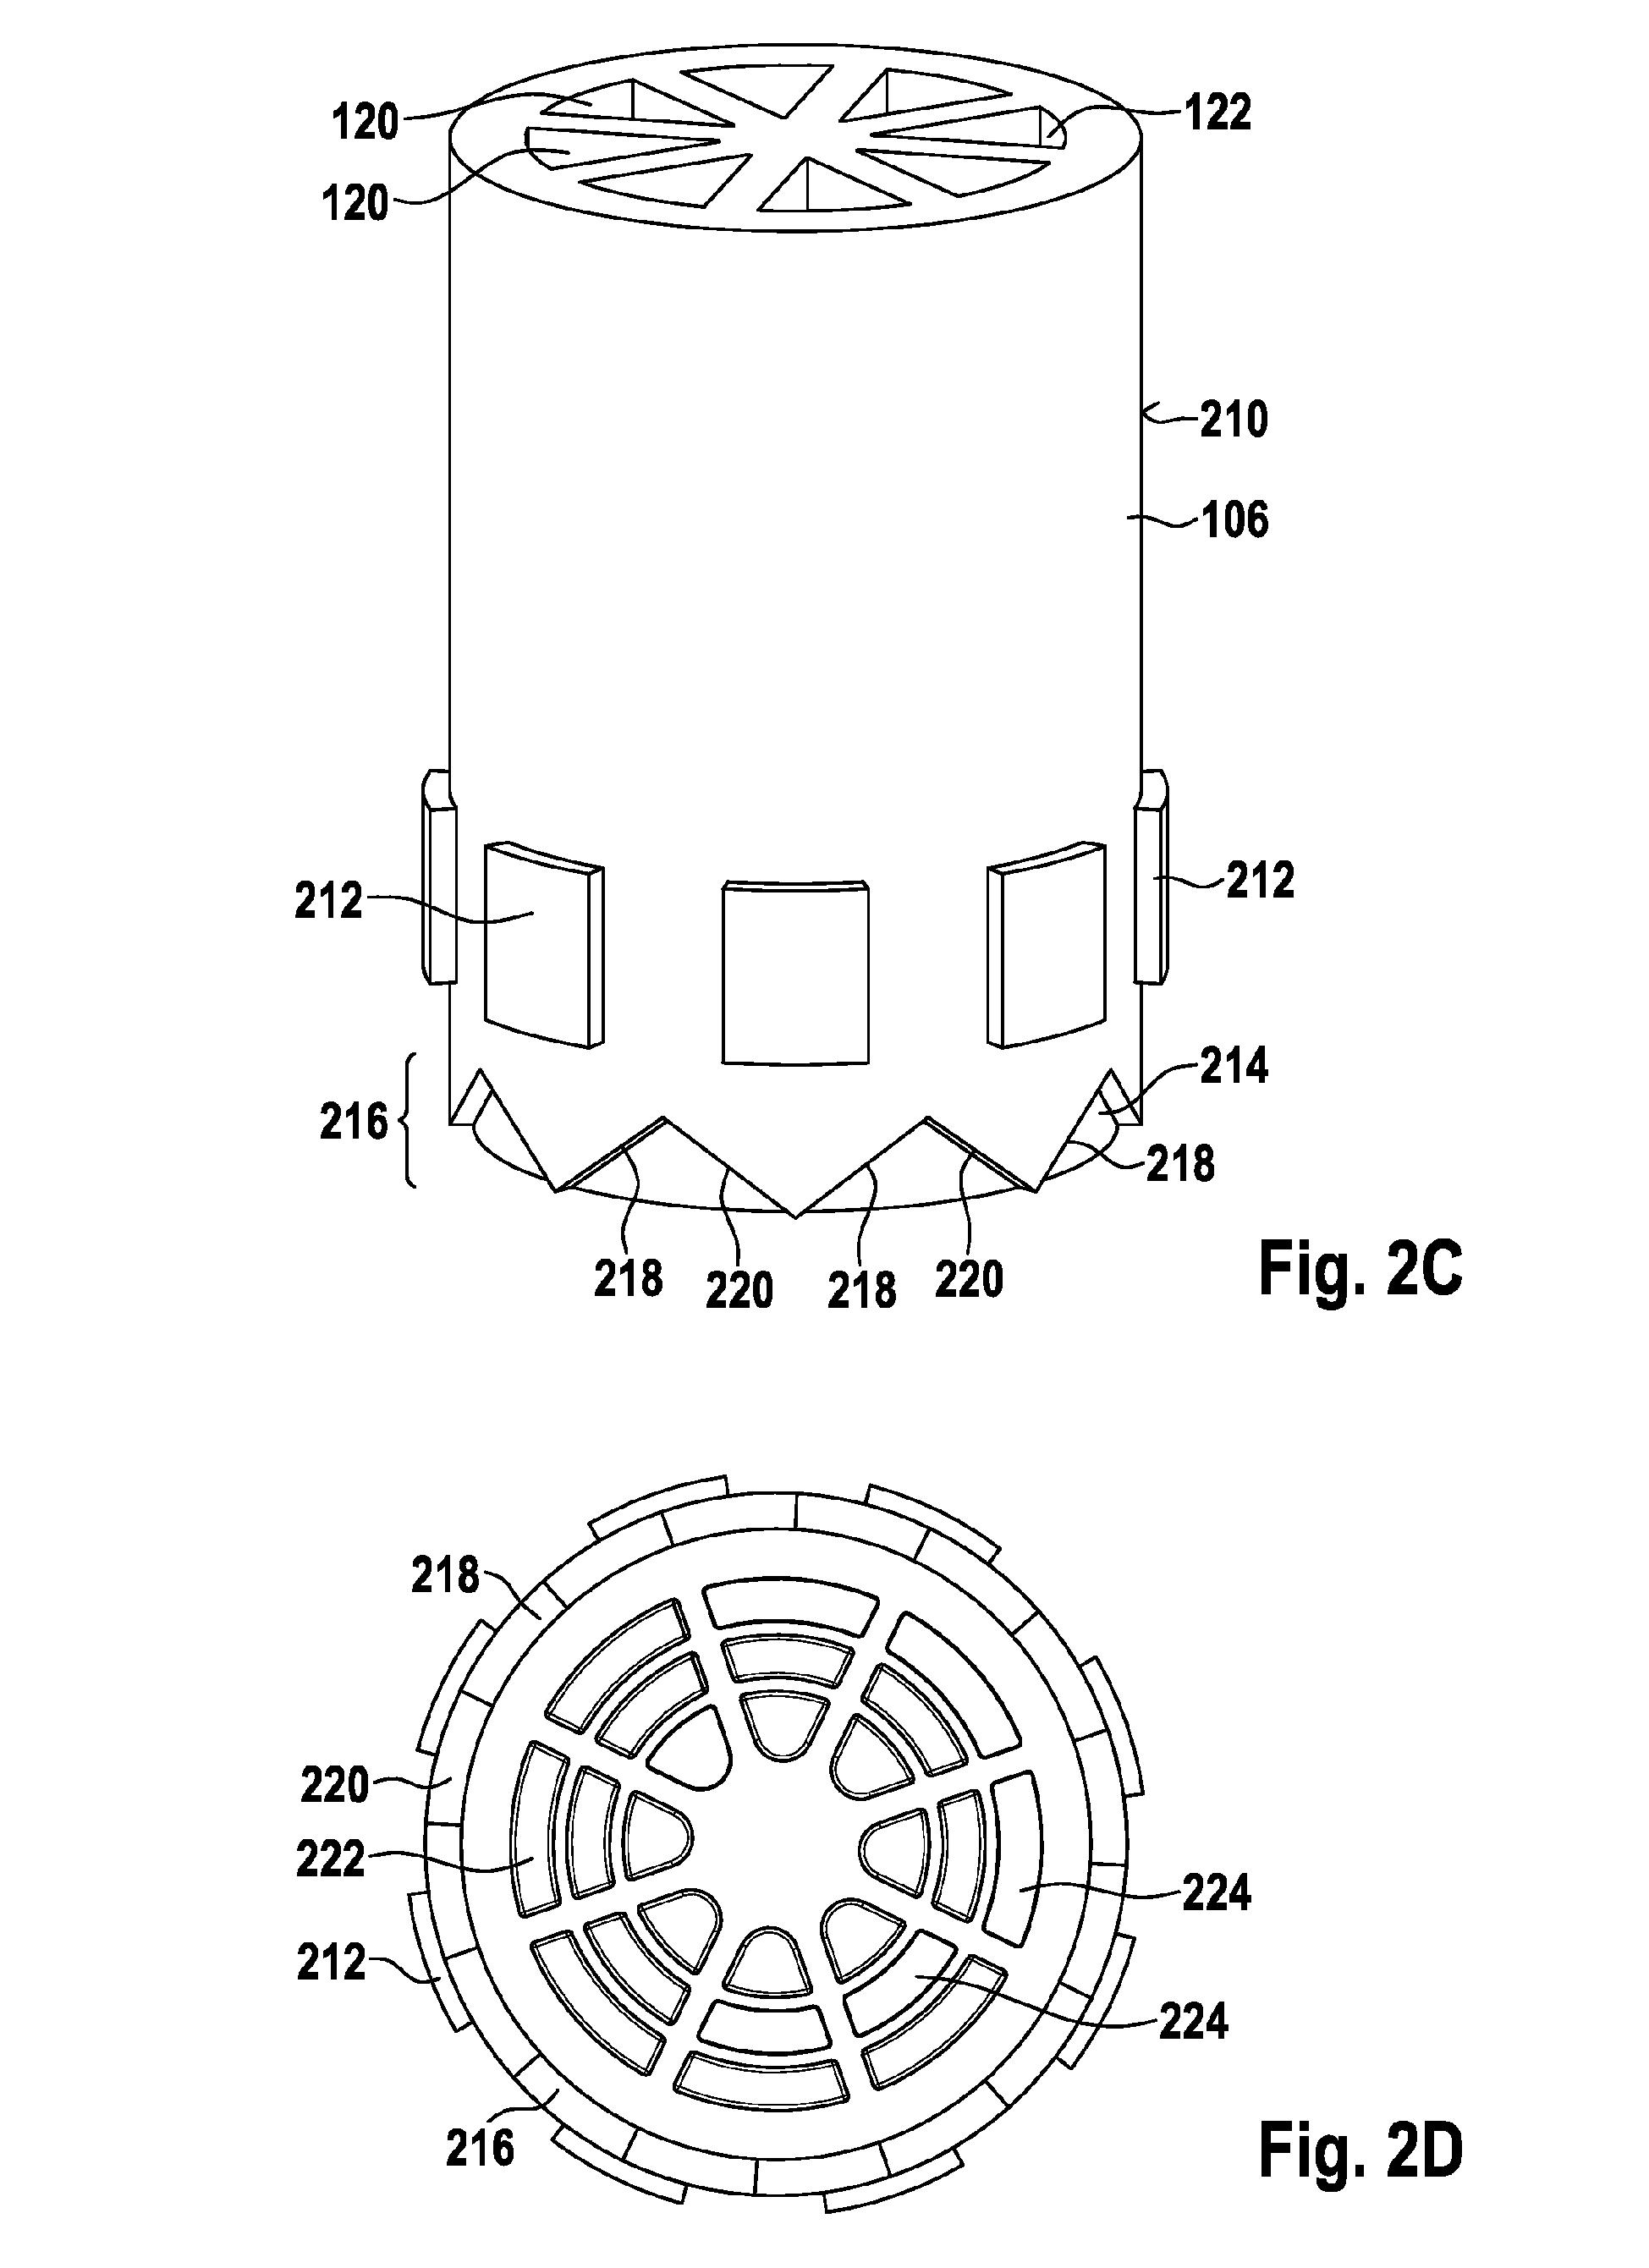 patente ep2532426a2 cartridge centrifuge and method google patentes. Black Bedroom Furniture Sets. Home Design Ideas